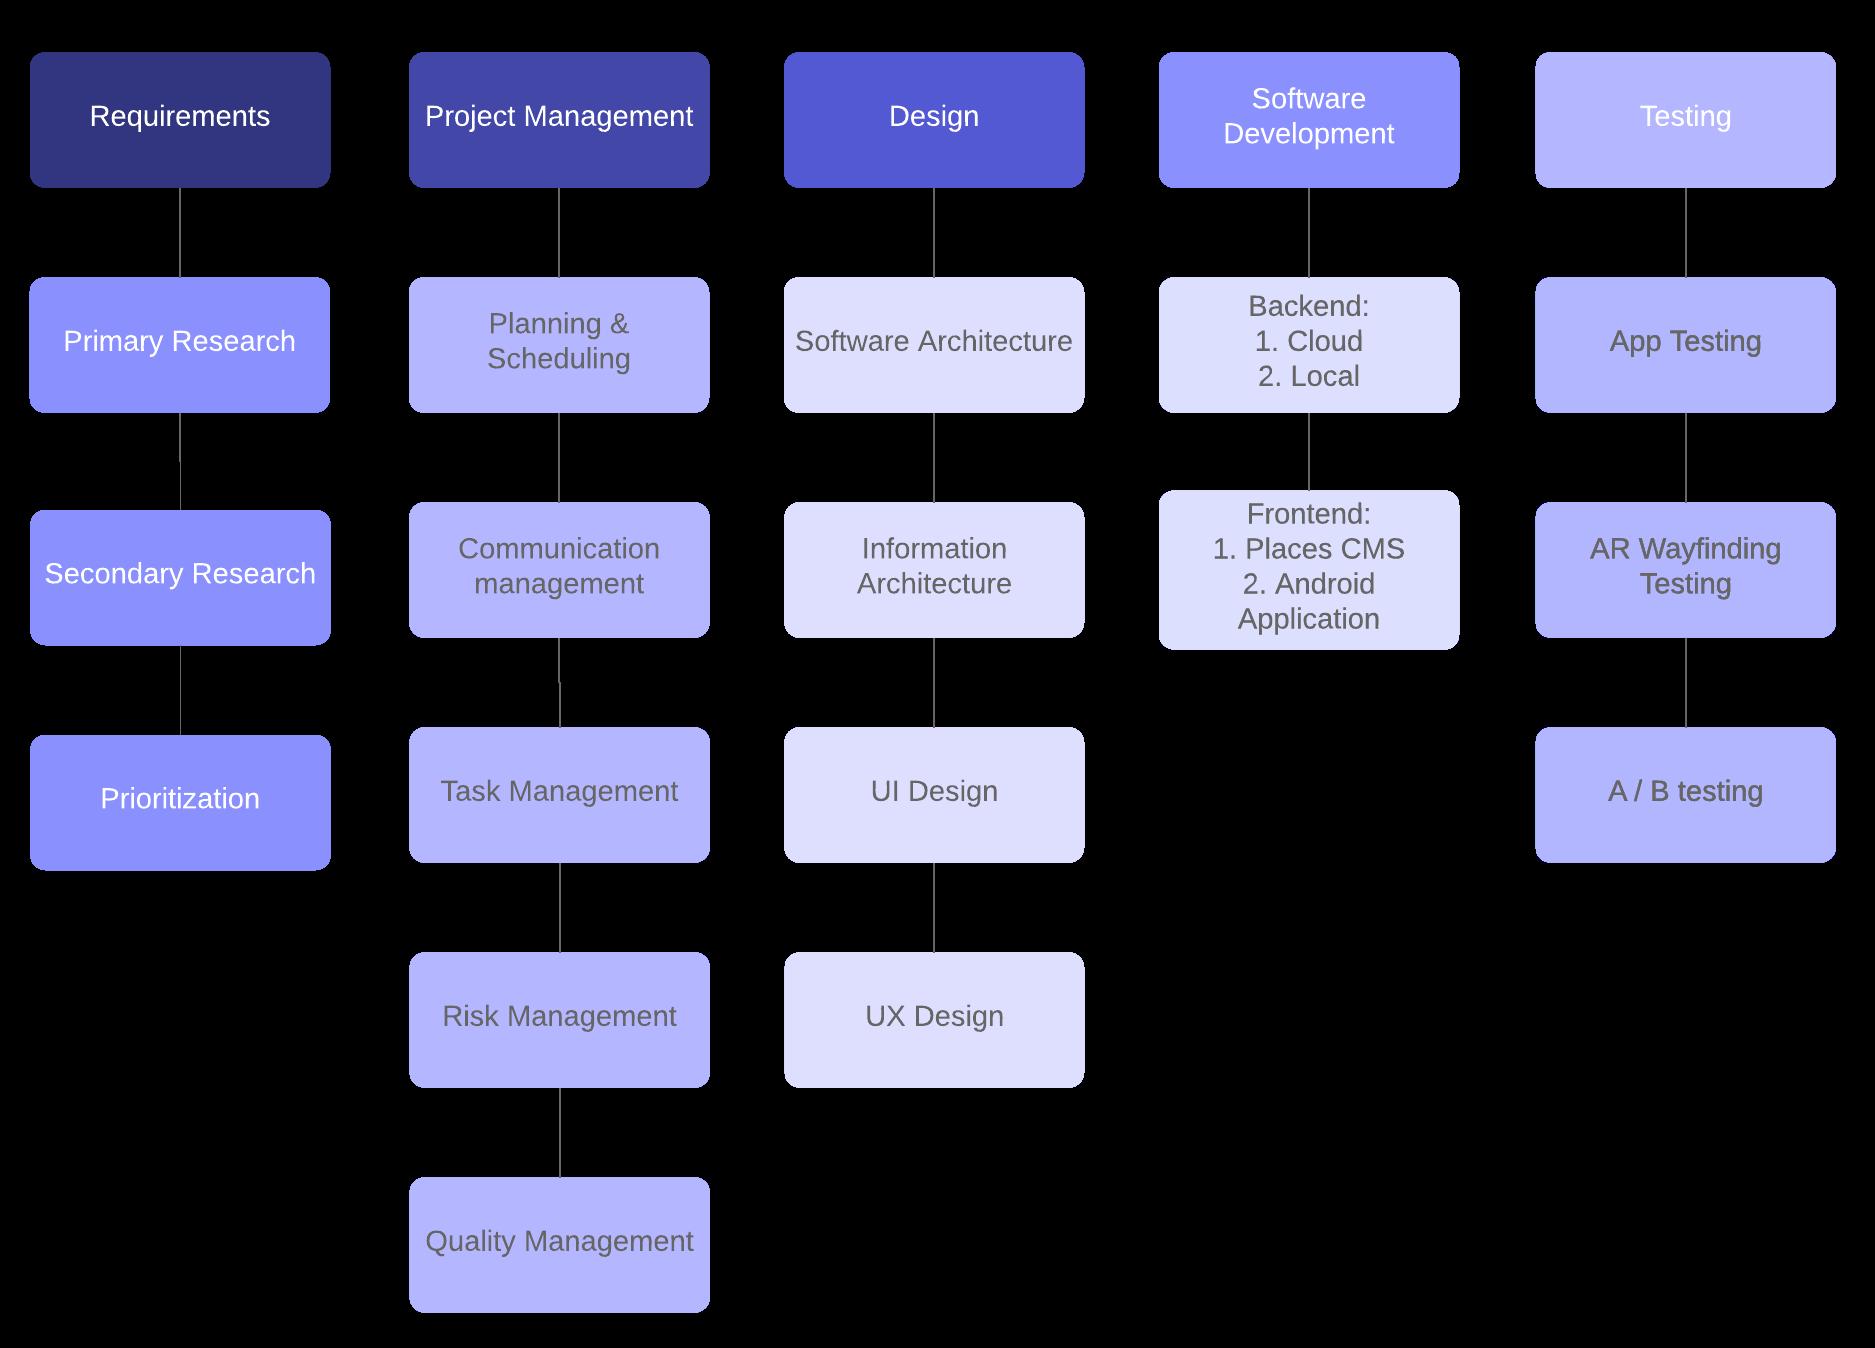 baggage handling system work breakdown structure